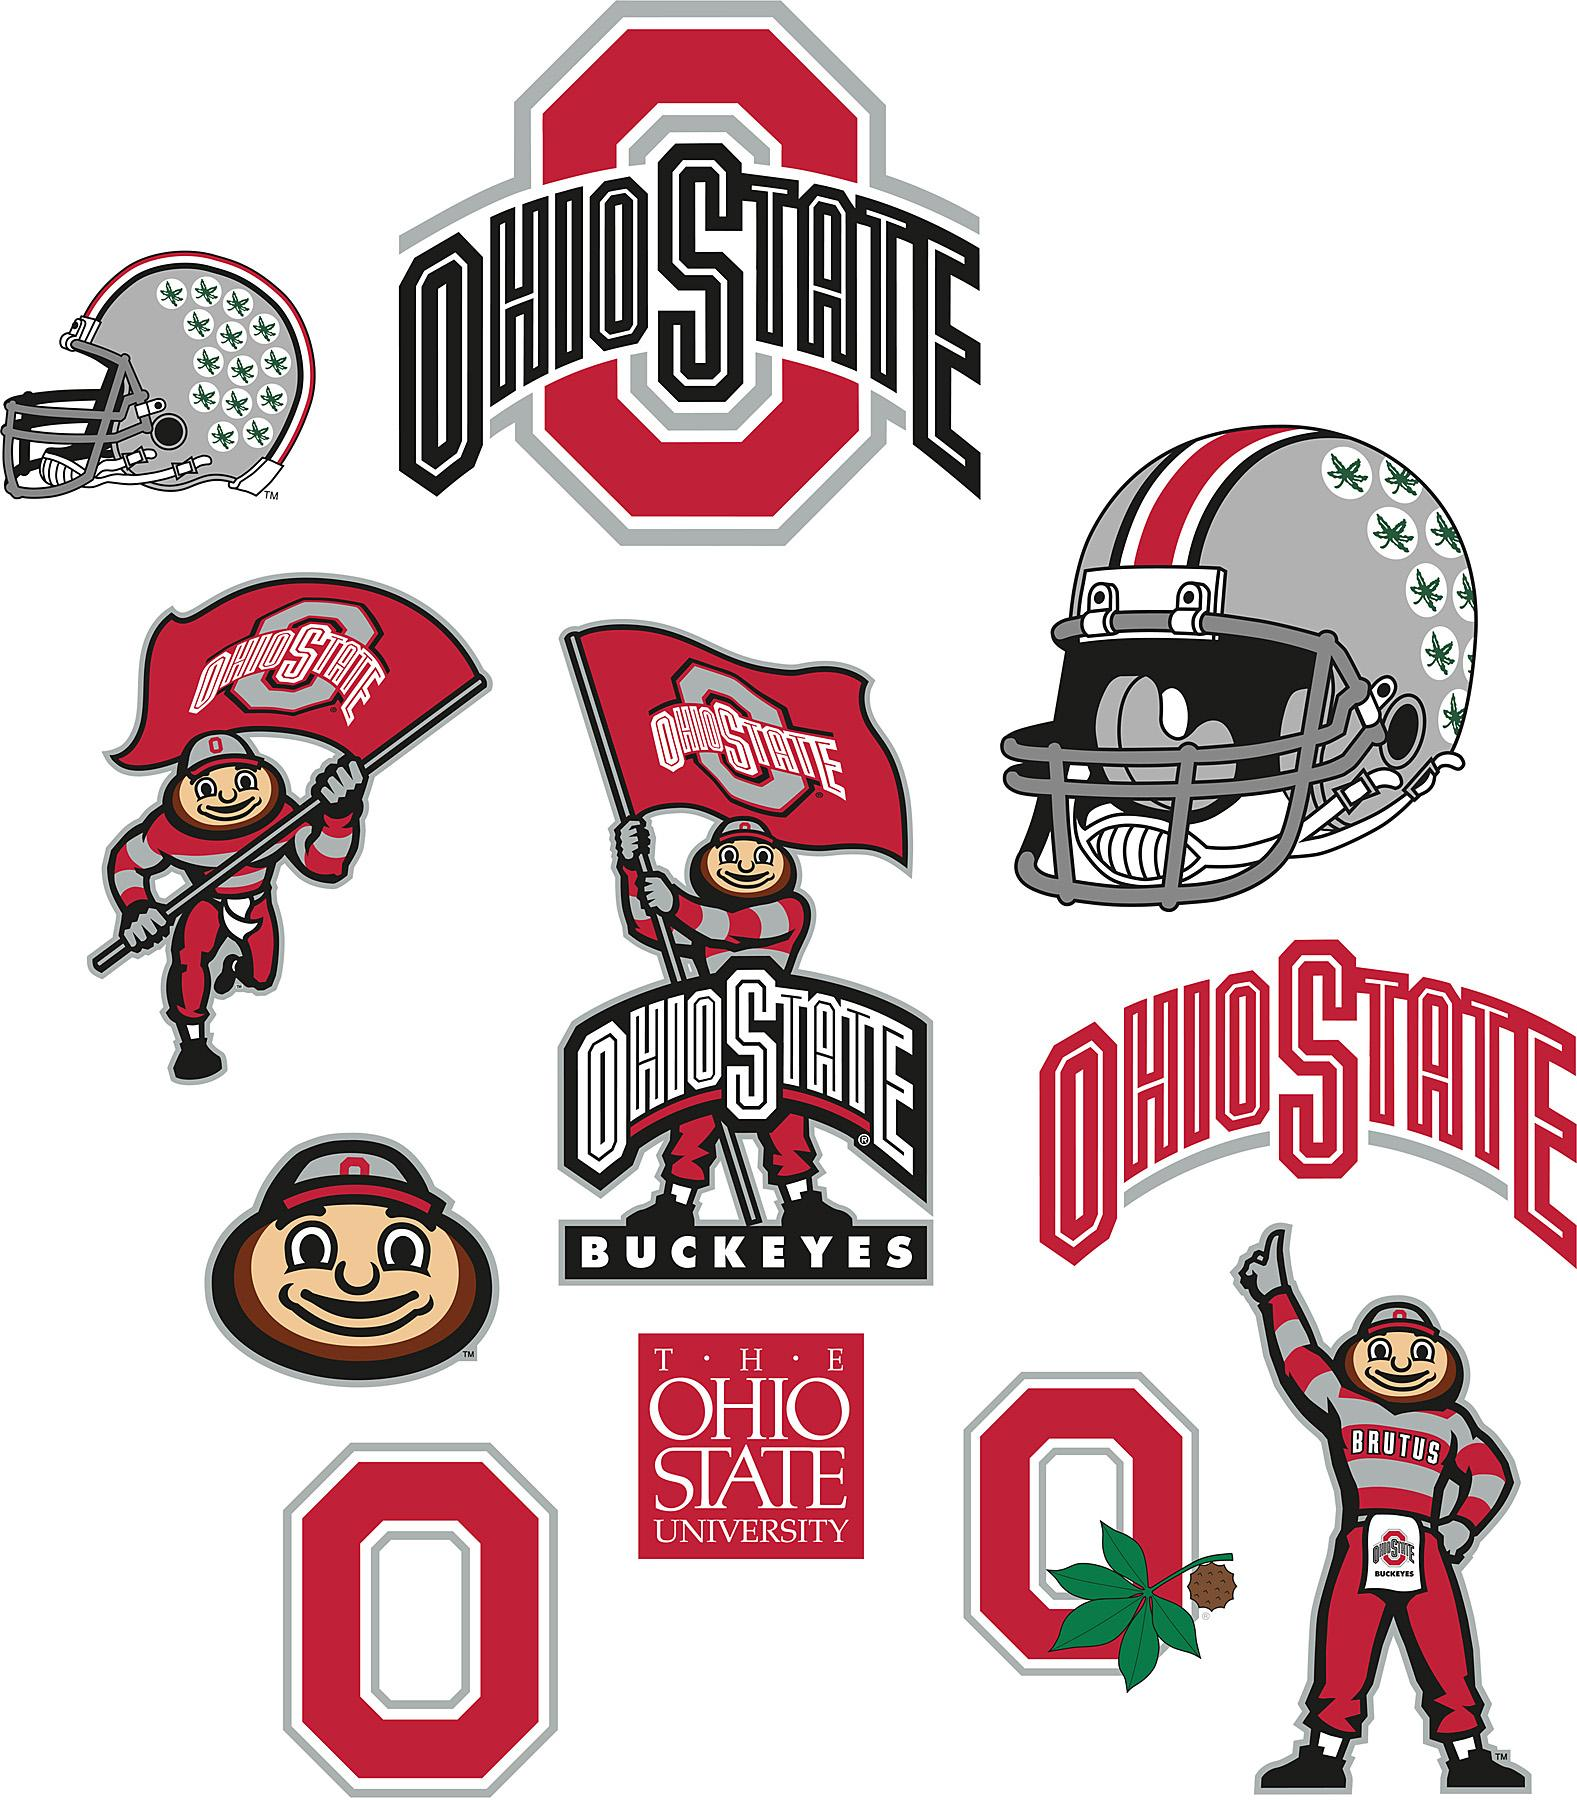 Ohio state buckeyes logo clip art.